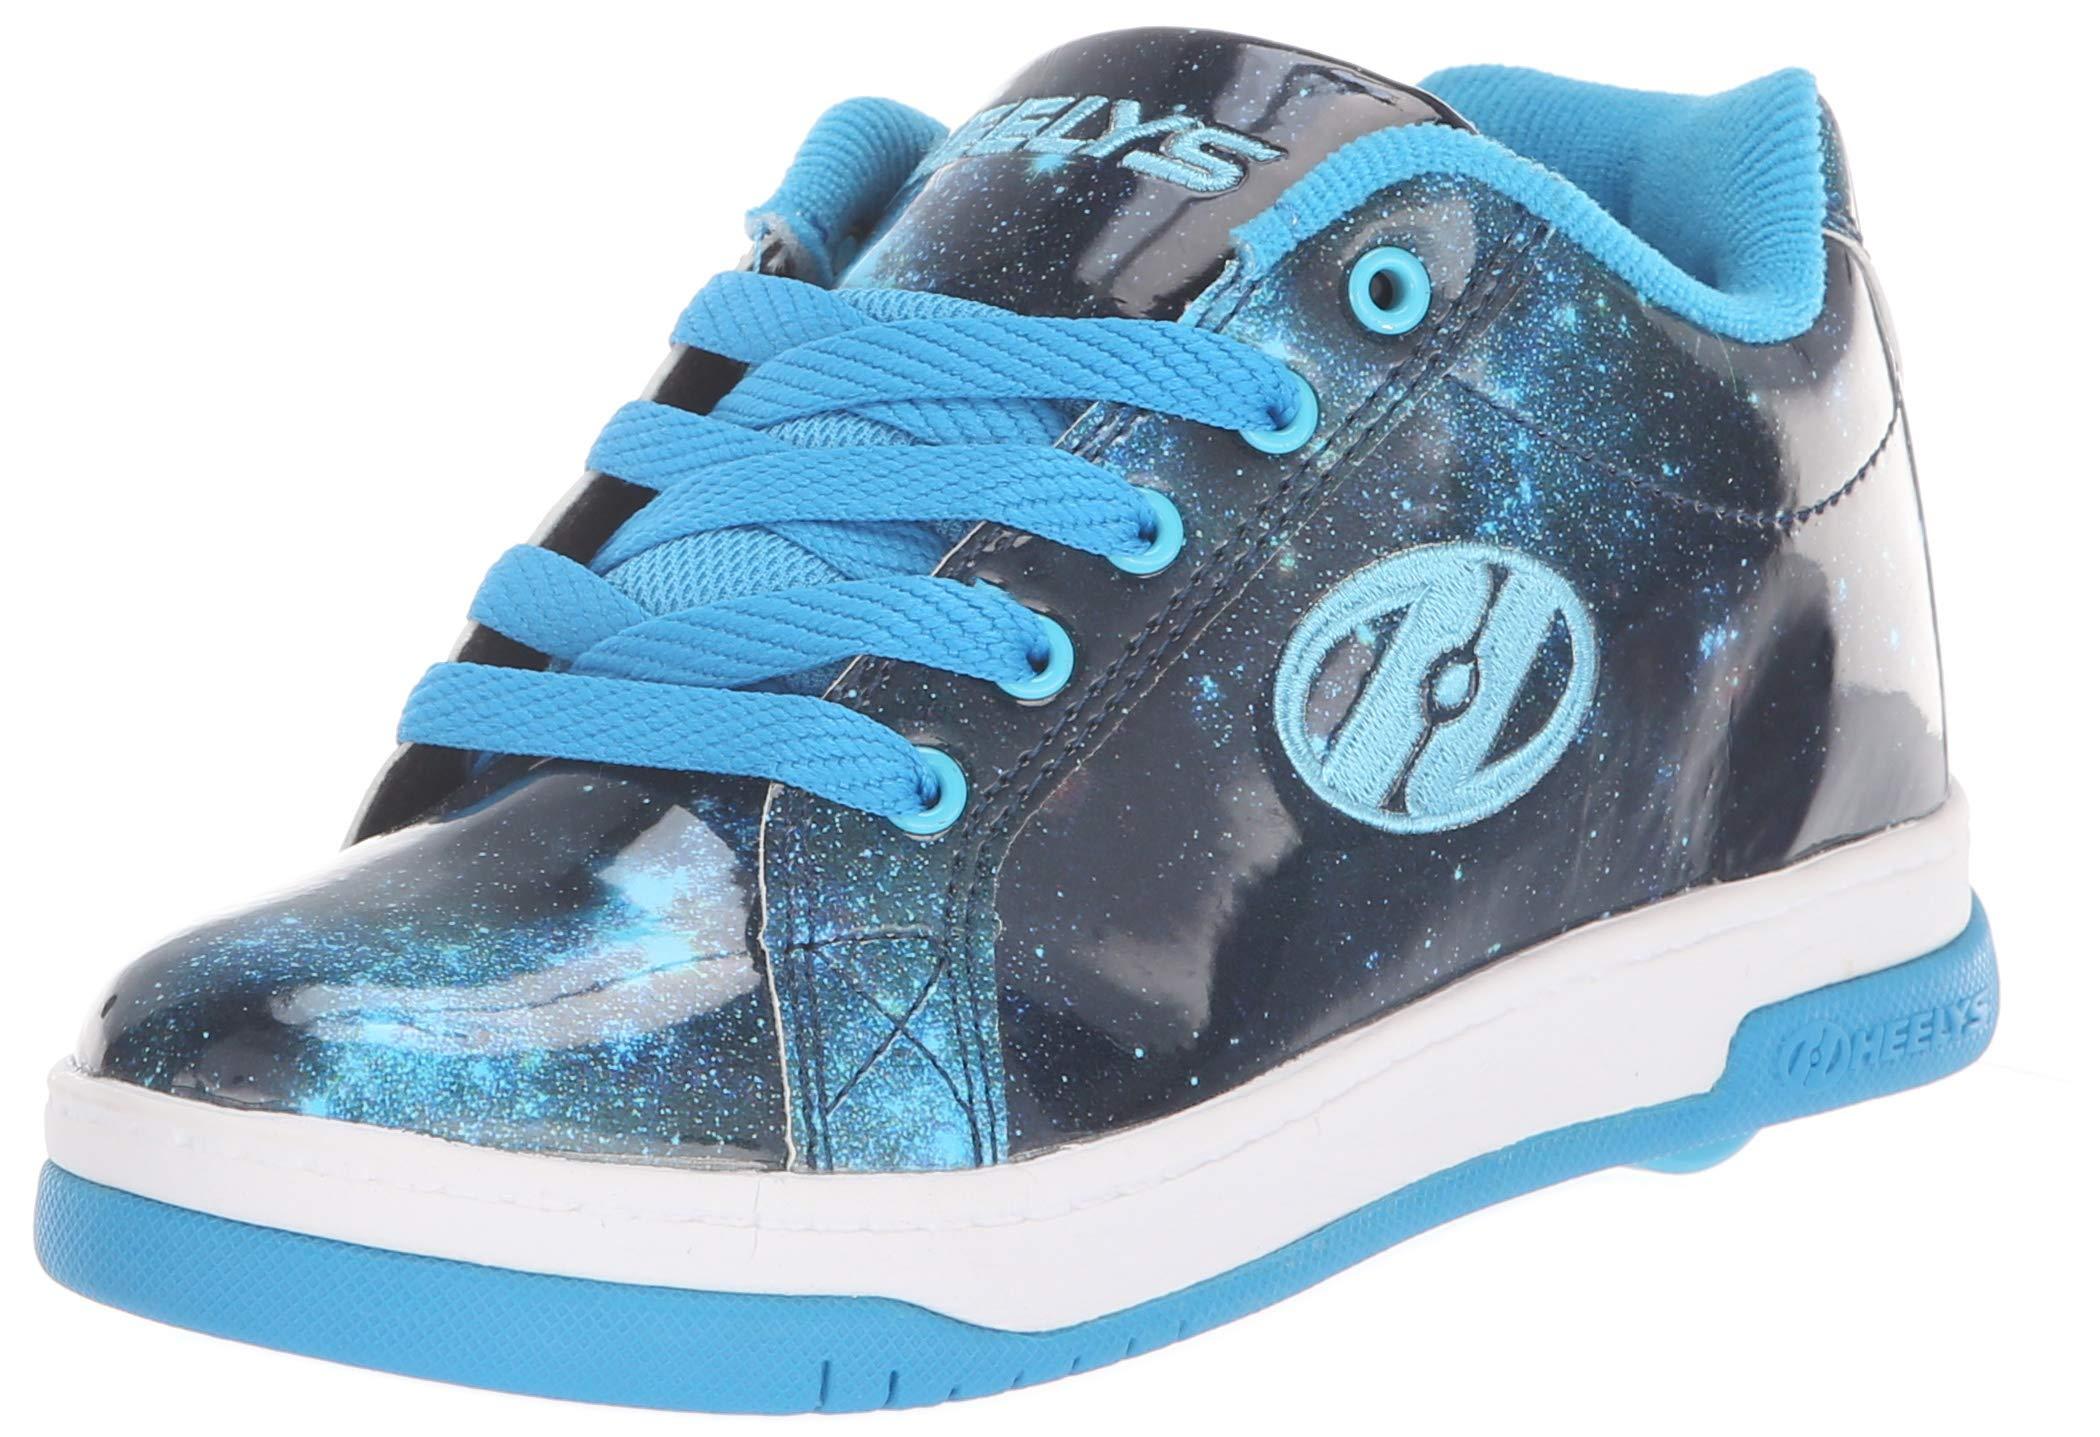 Heelys Girls' Split Tennis Shoe Blue/Galaxy 2 M US Big Kid by Heelys (Image #1)